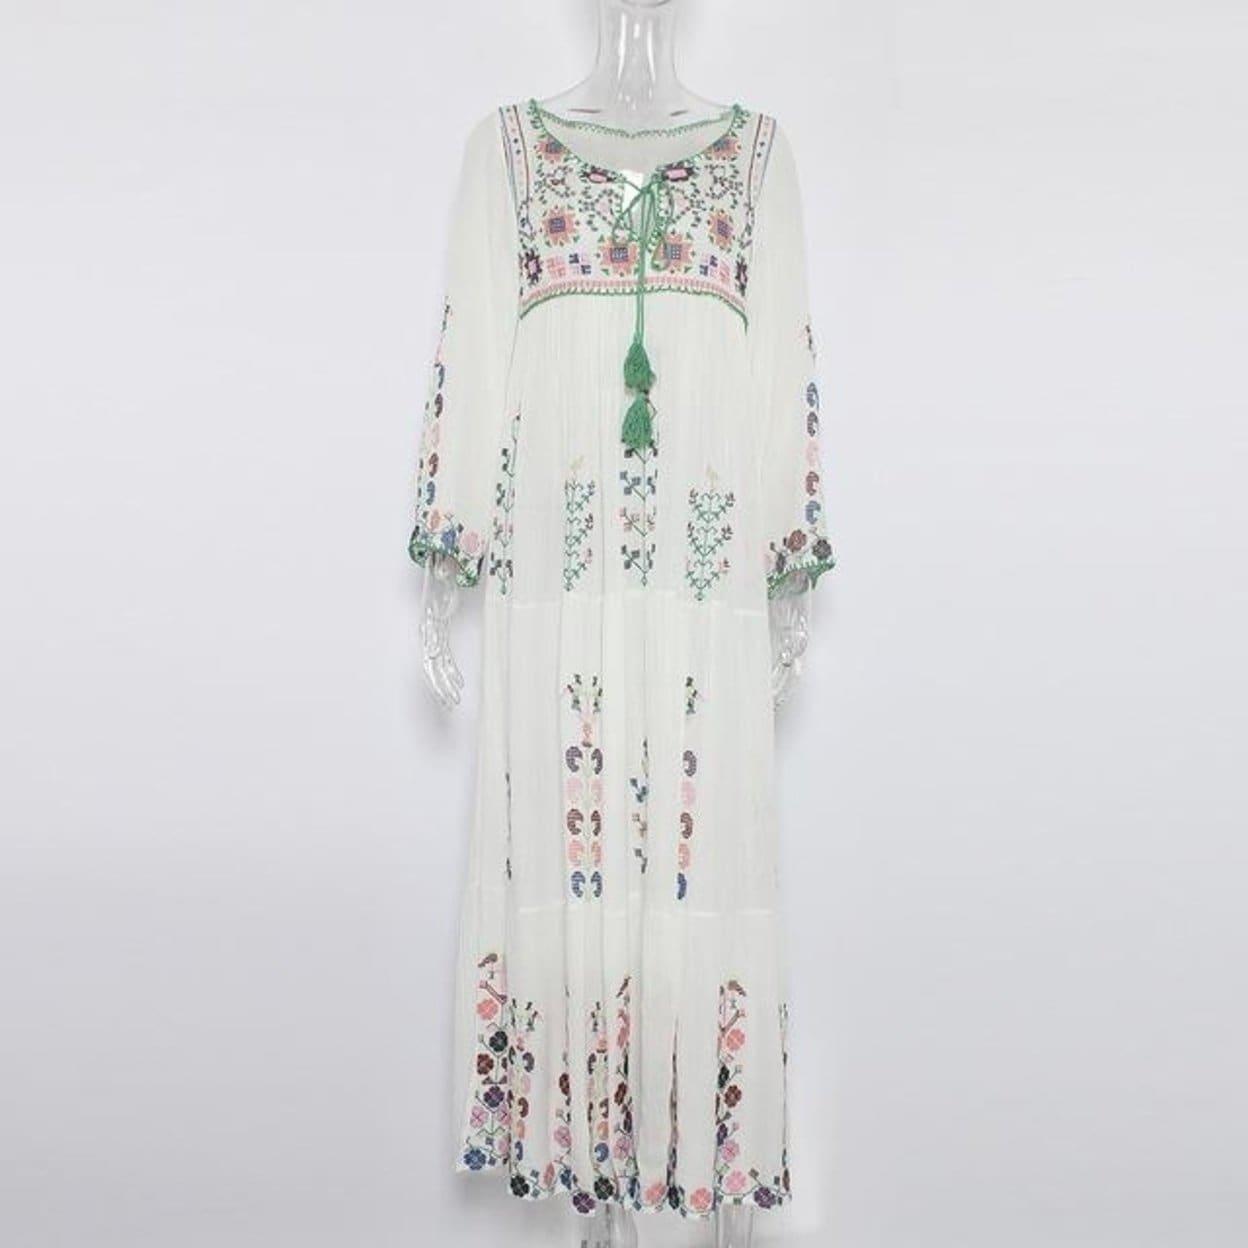 e331d53e6ebe4 Jastie Floral Embroidered Maxi Dress Tassel V-Neck Long Sleeve Summer Dress  Vintage Boho Chic Beach Style Dresses Vestidos 2017